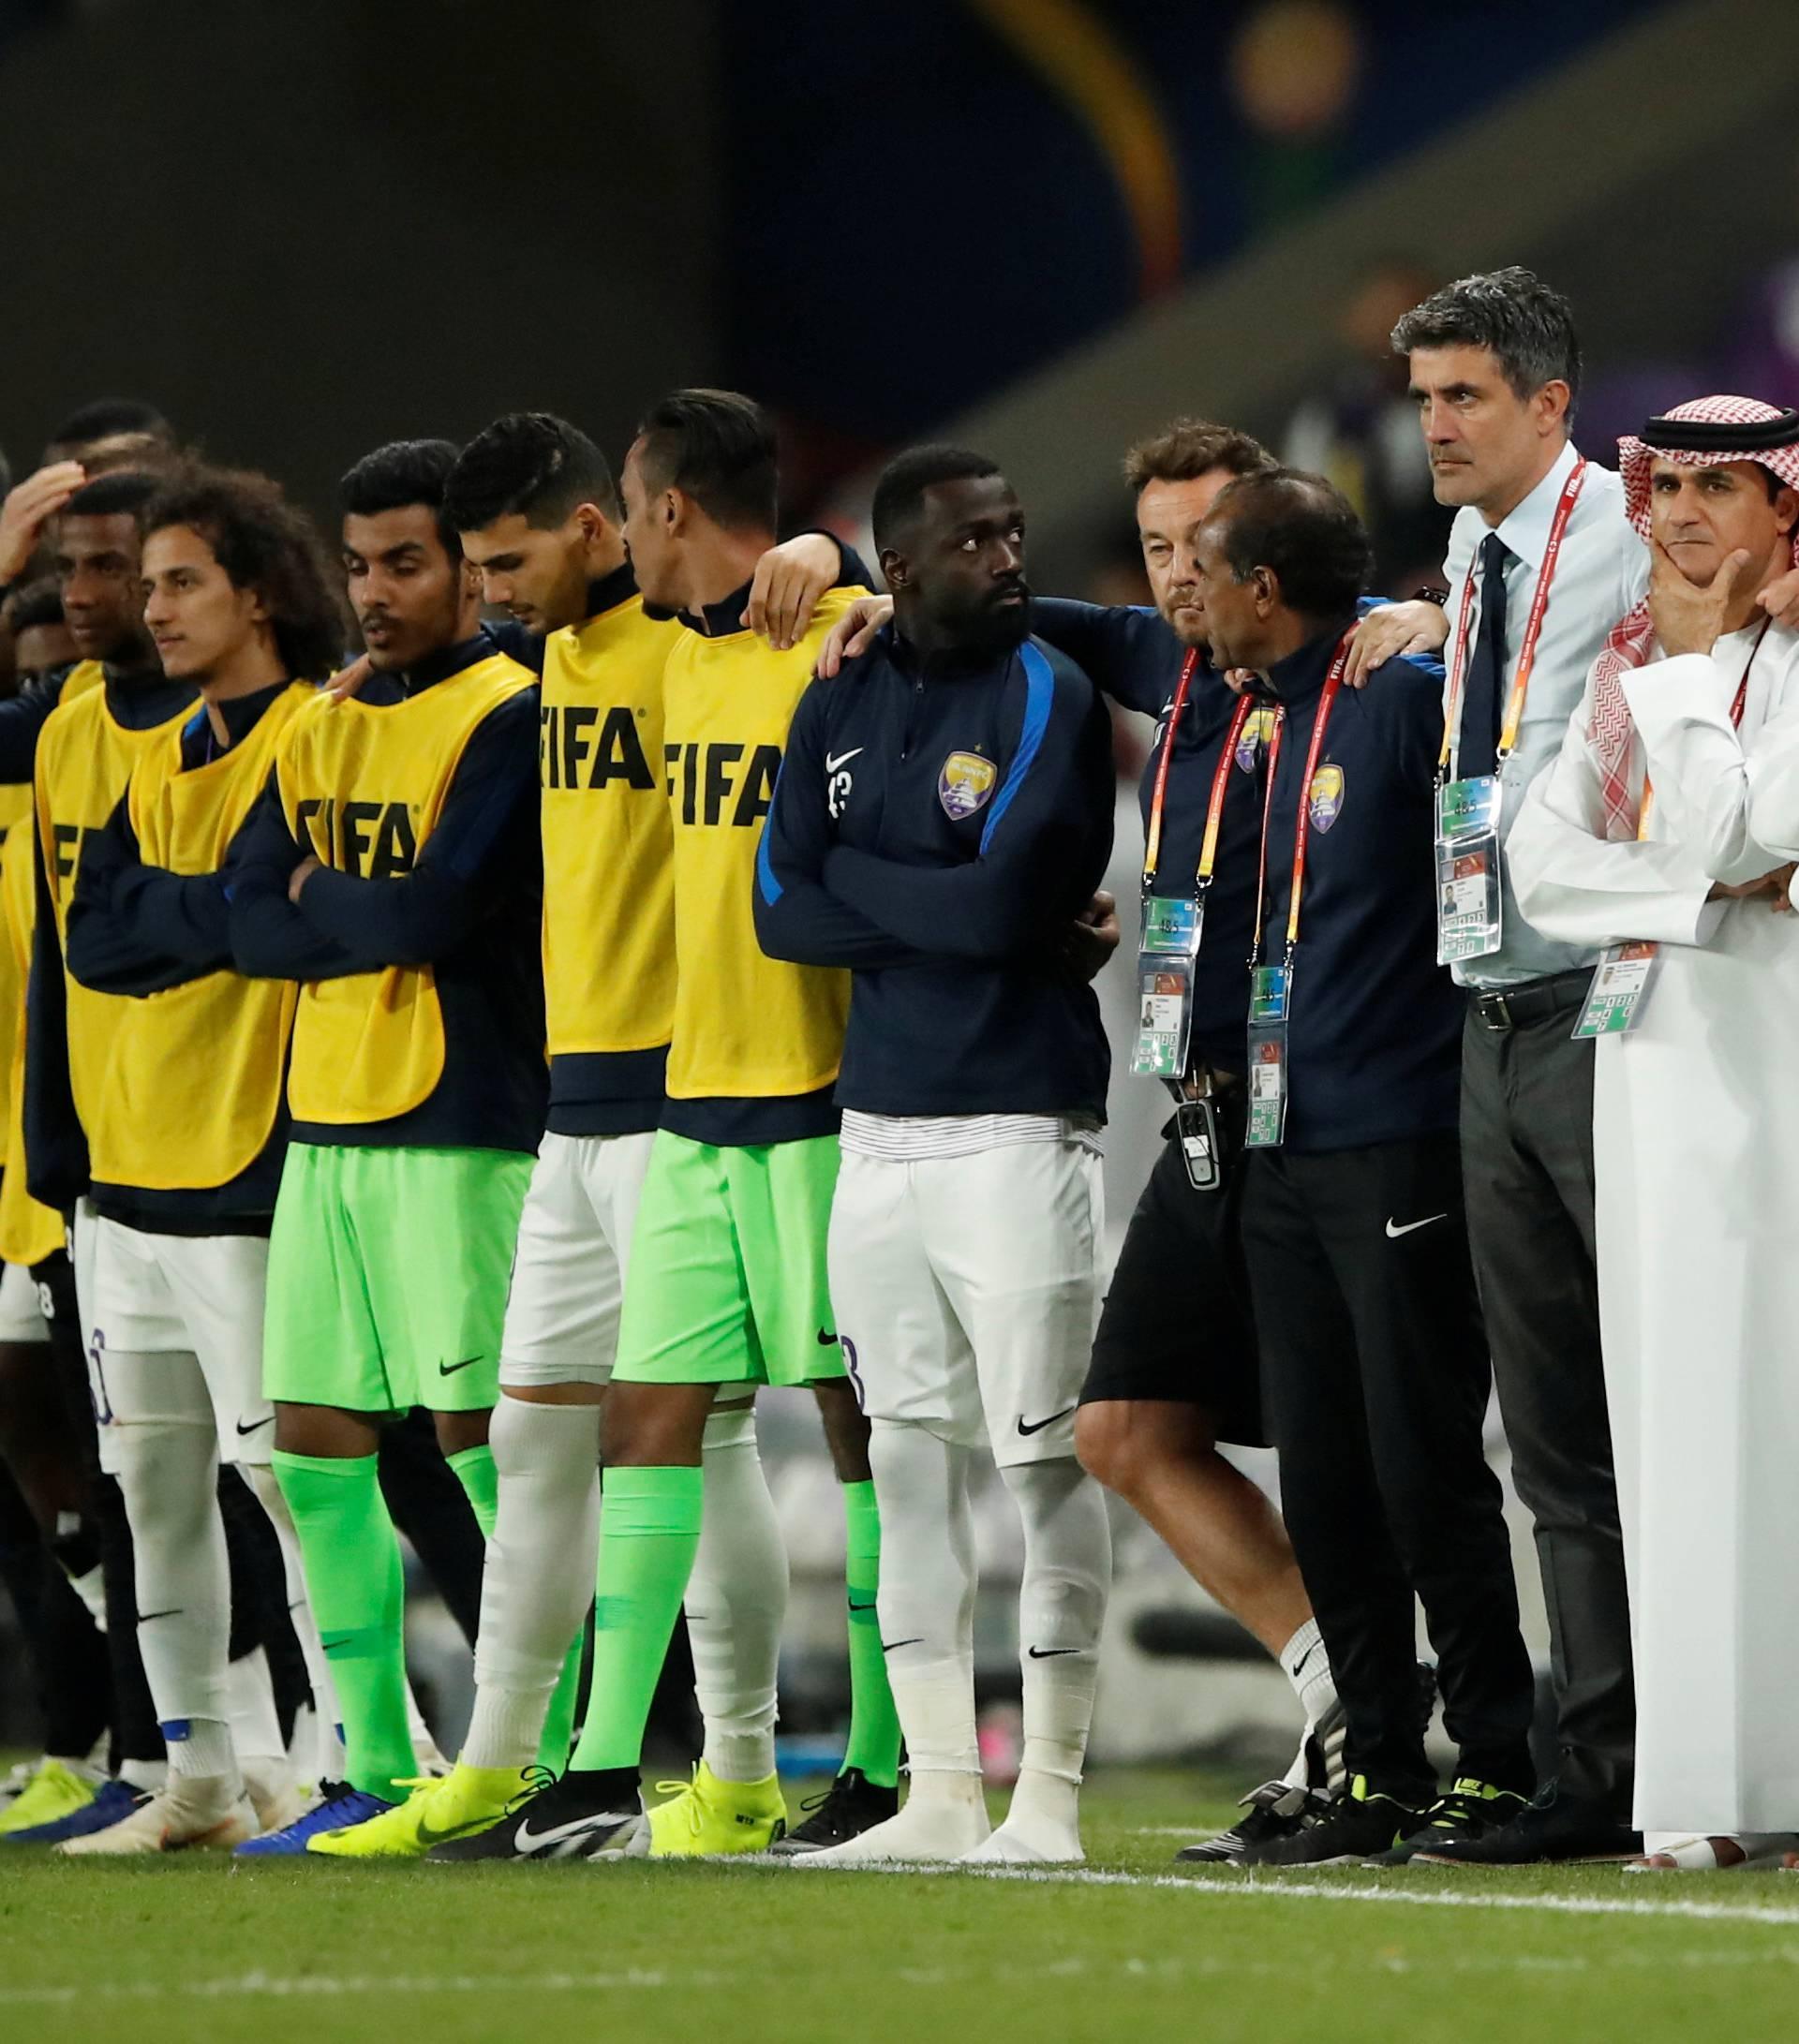 Club World Cup - Semi-Final - River Plate v Al Ain FC